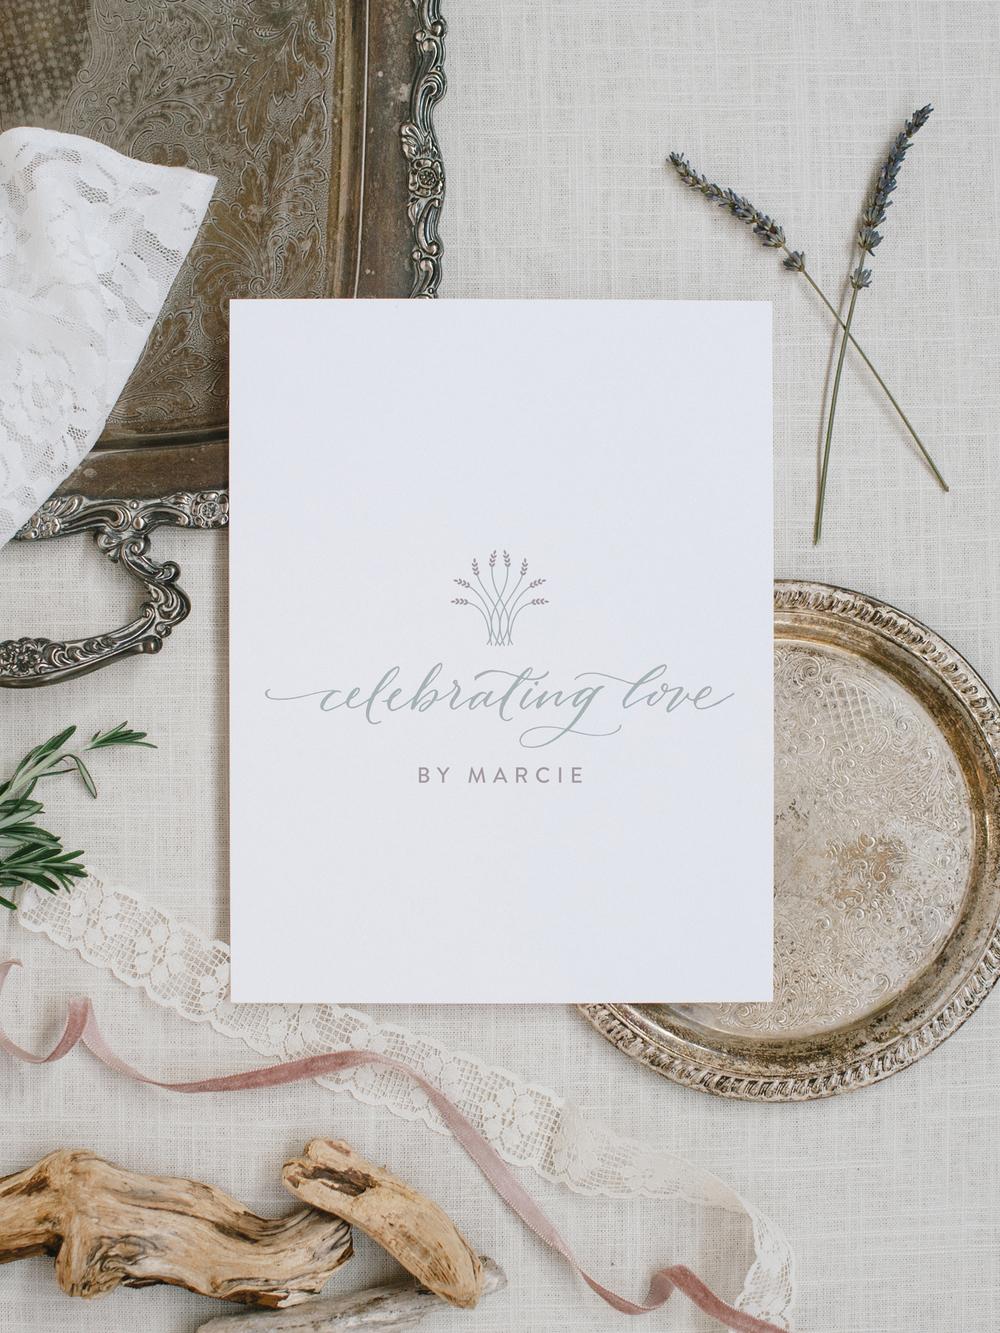 celebrating love by marcie